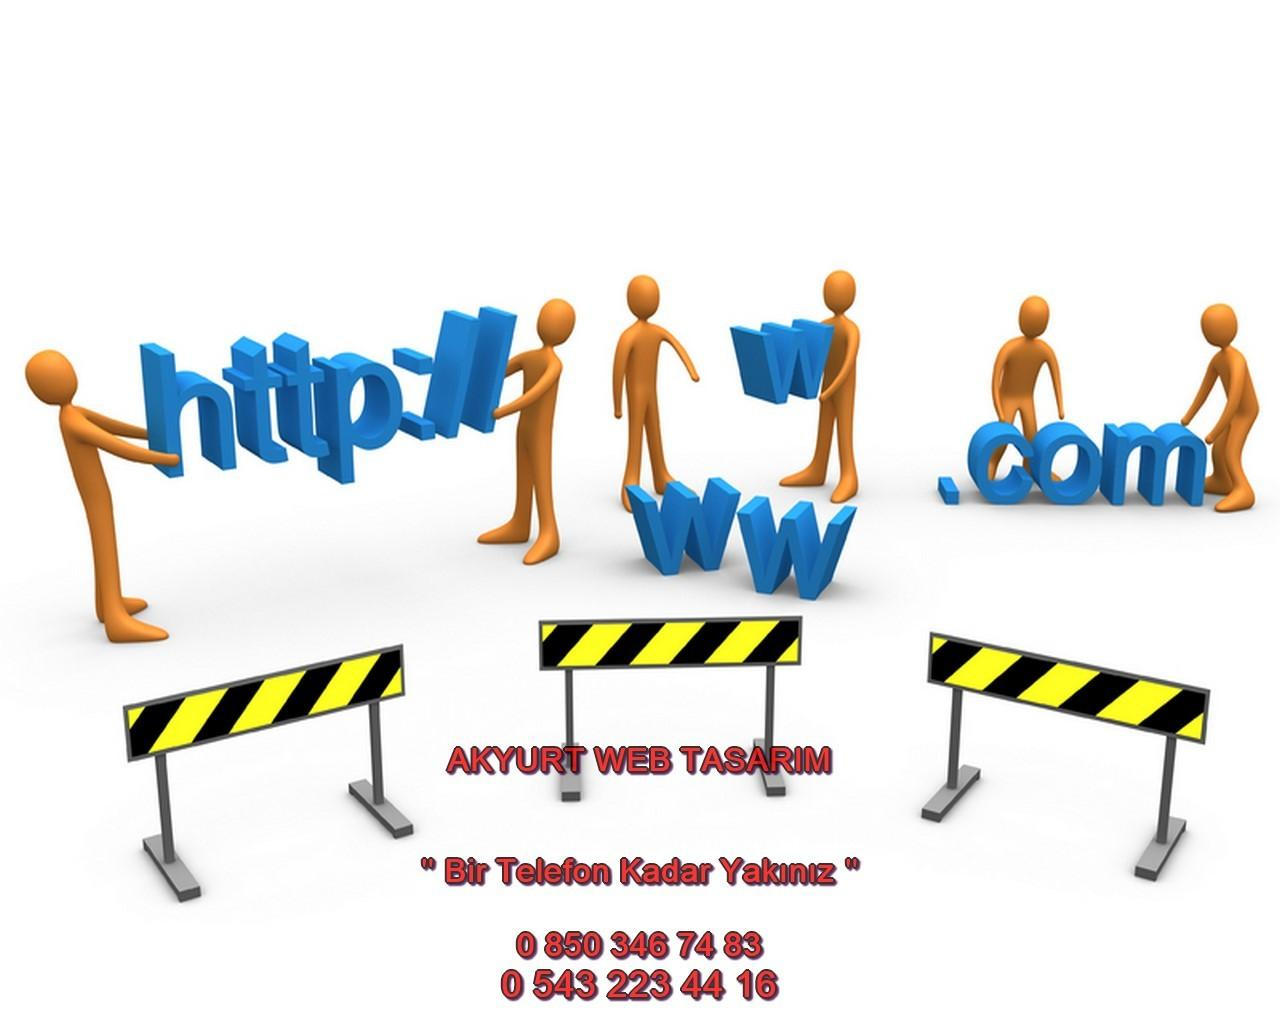 Akyurt Web Tasarım